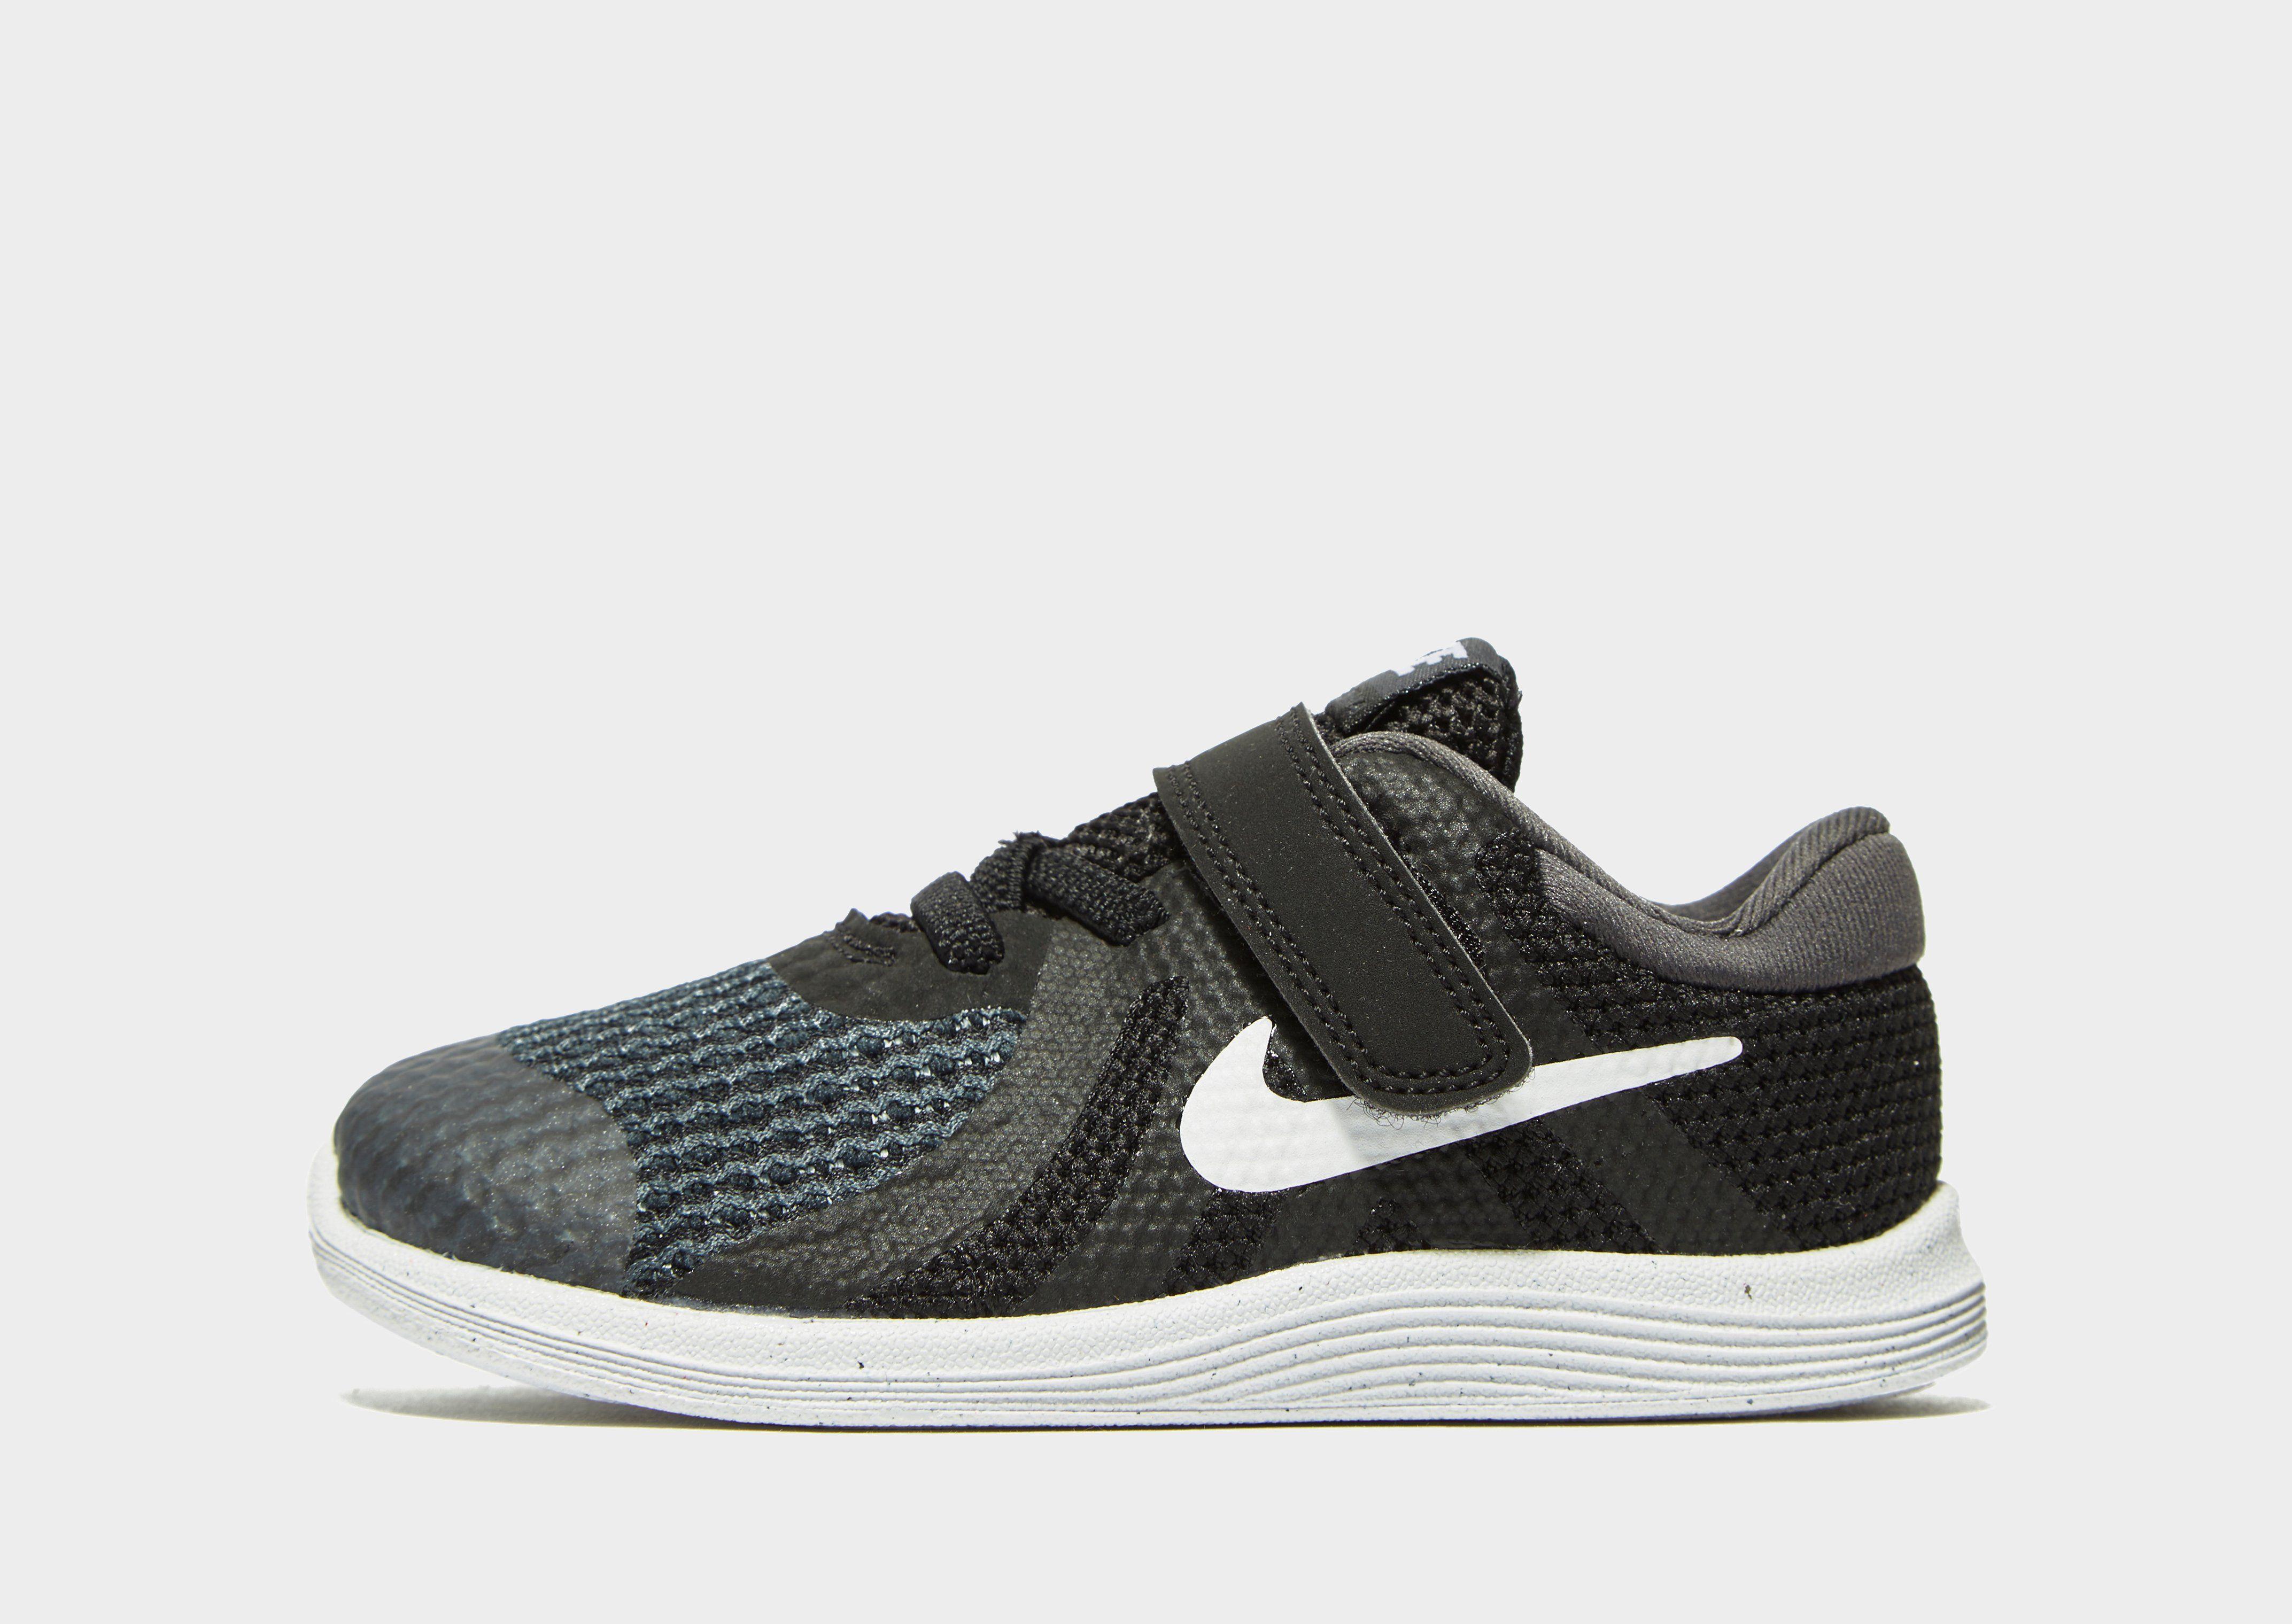 401819add72 Nike Revolution 4 Infant